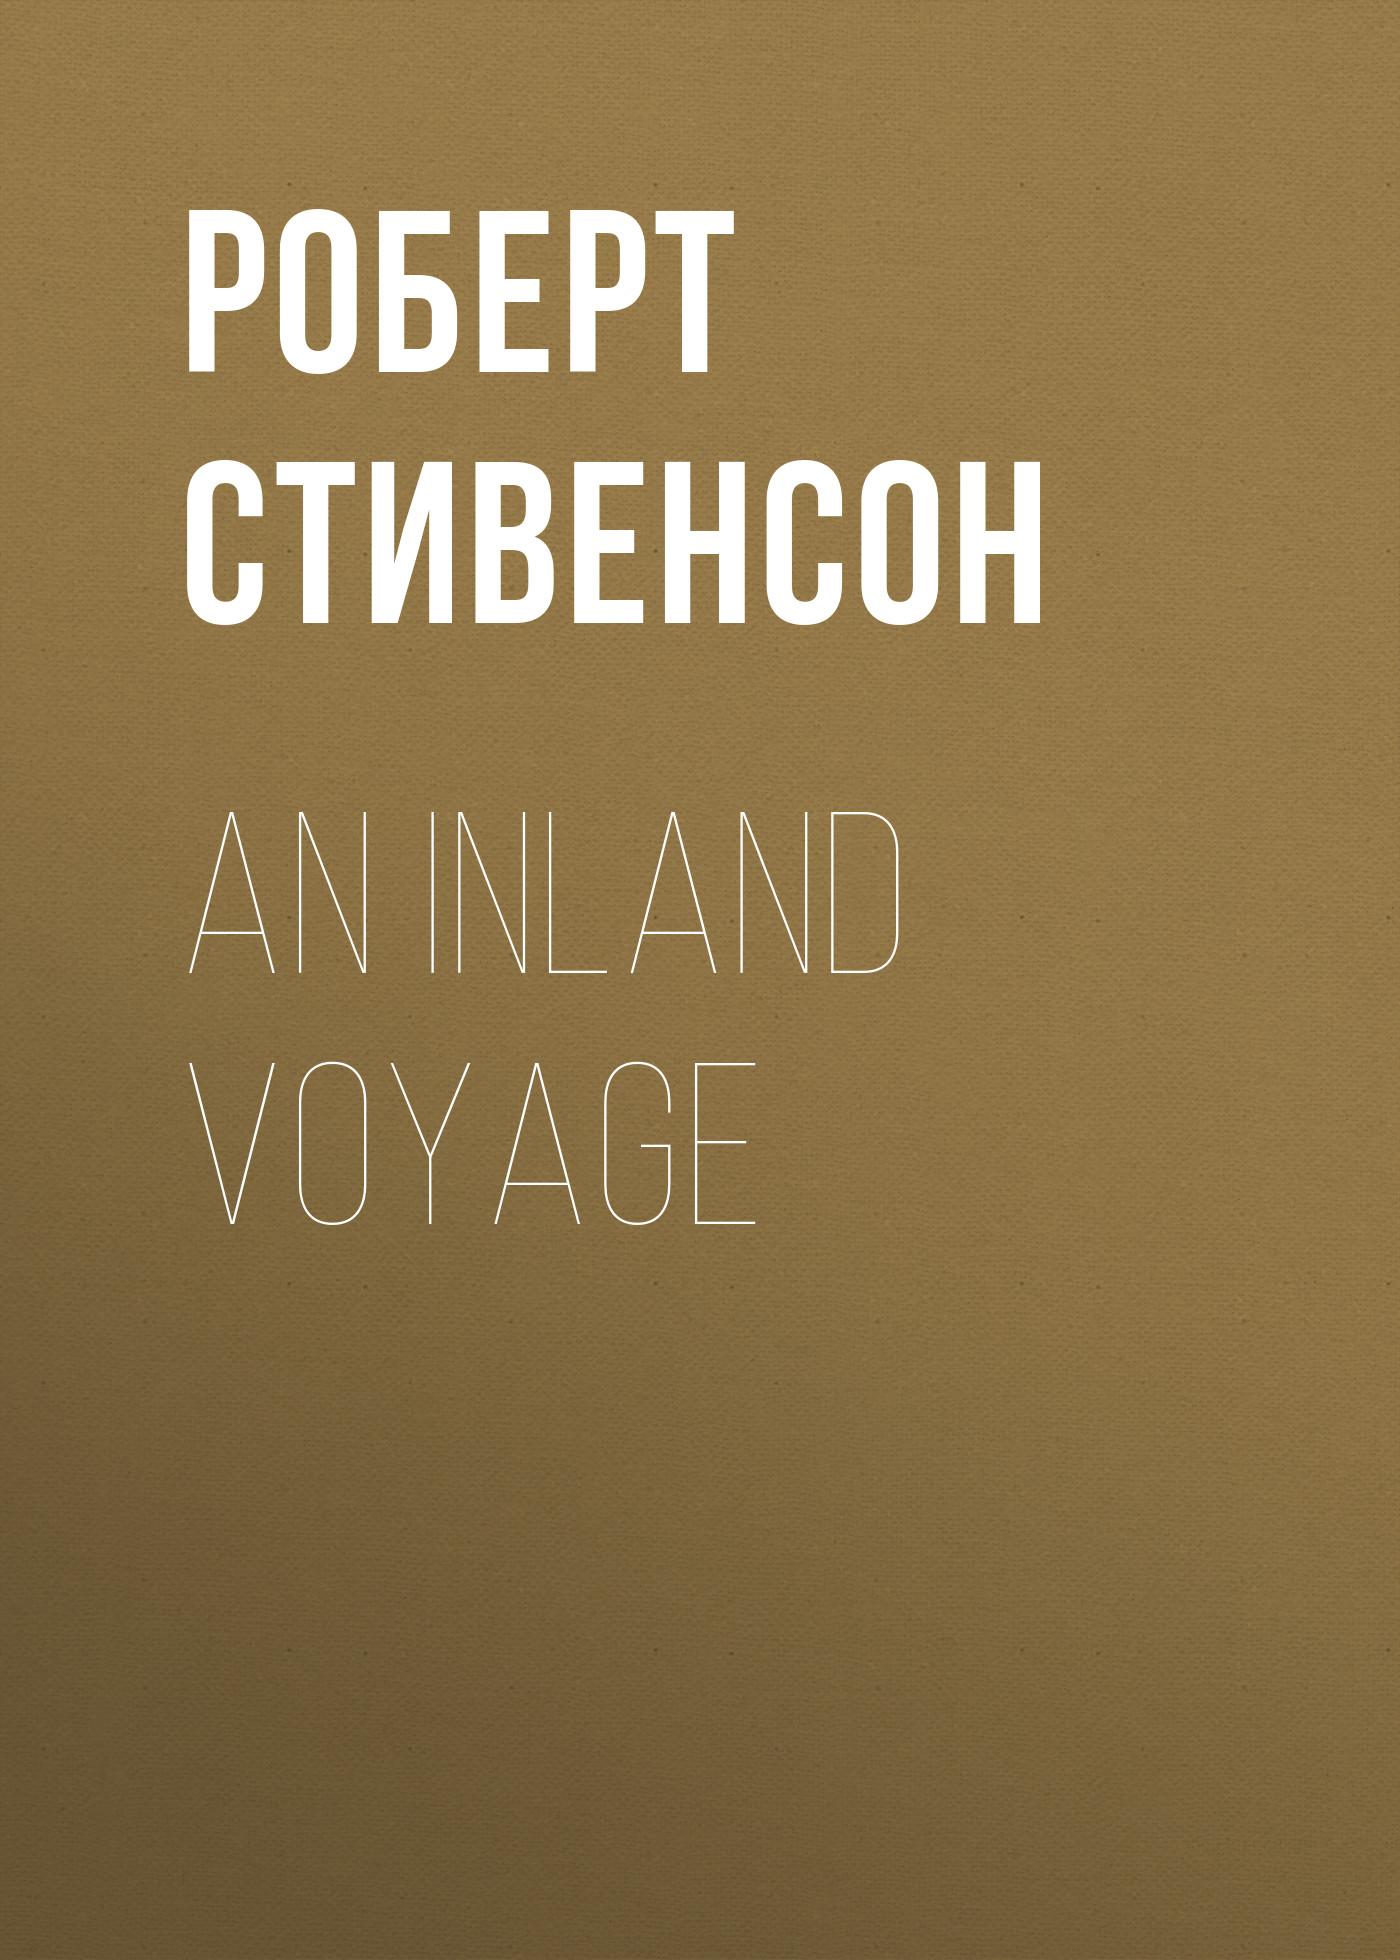 все цены на Роберт Льюис Стивенсон An Inland Voyage онлайн